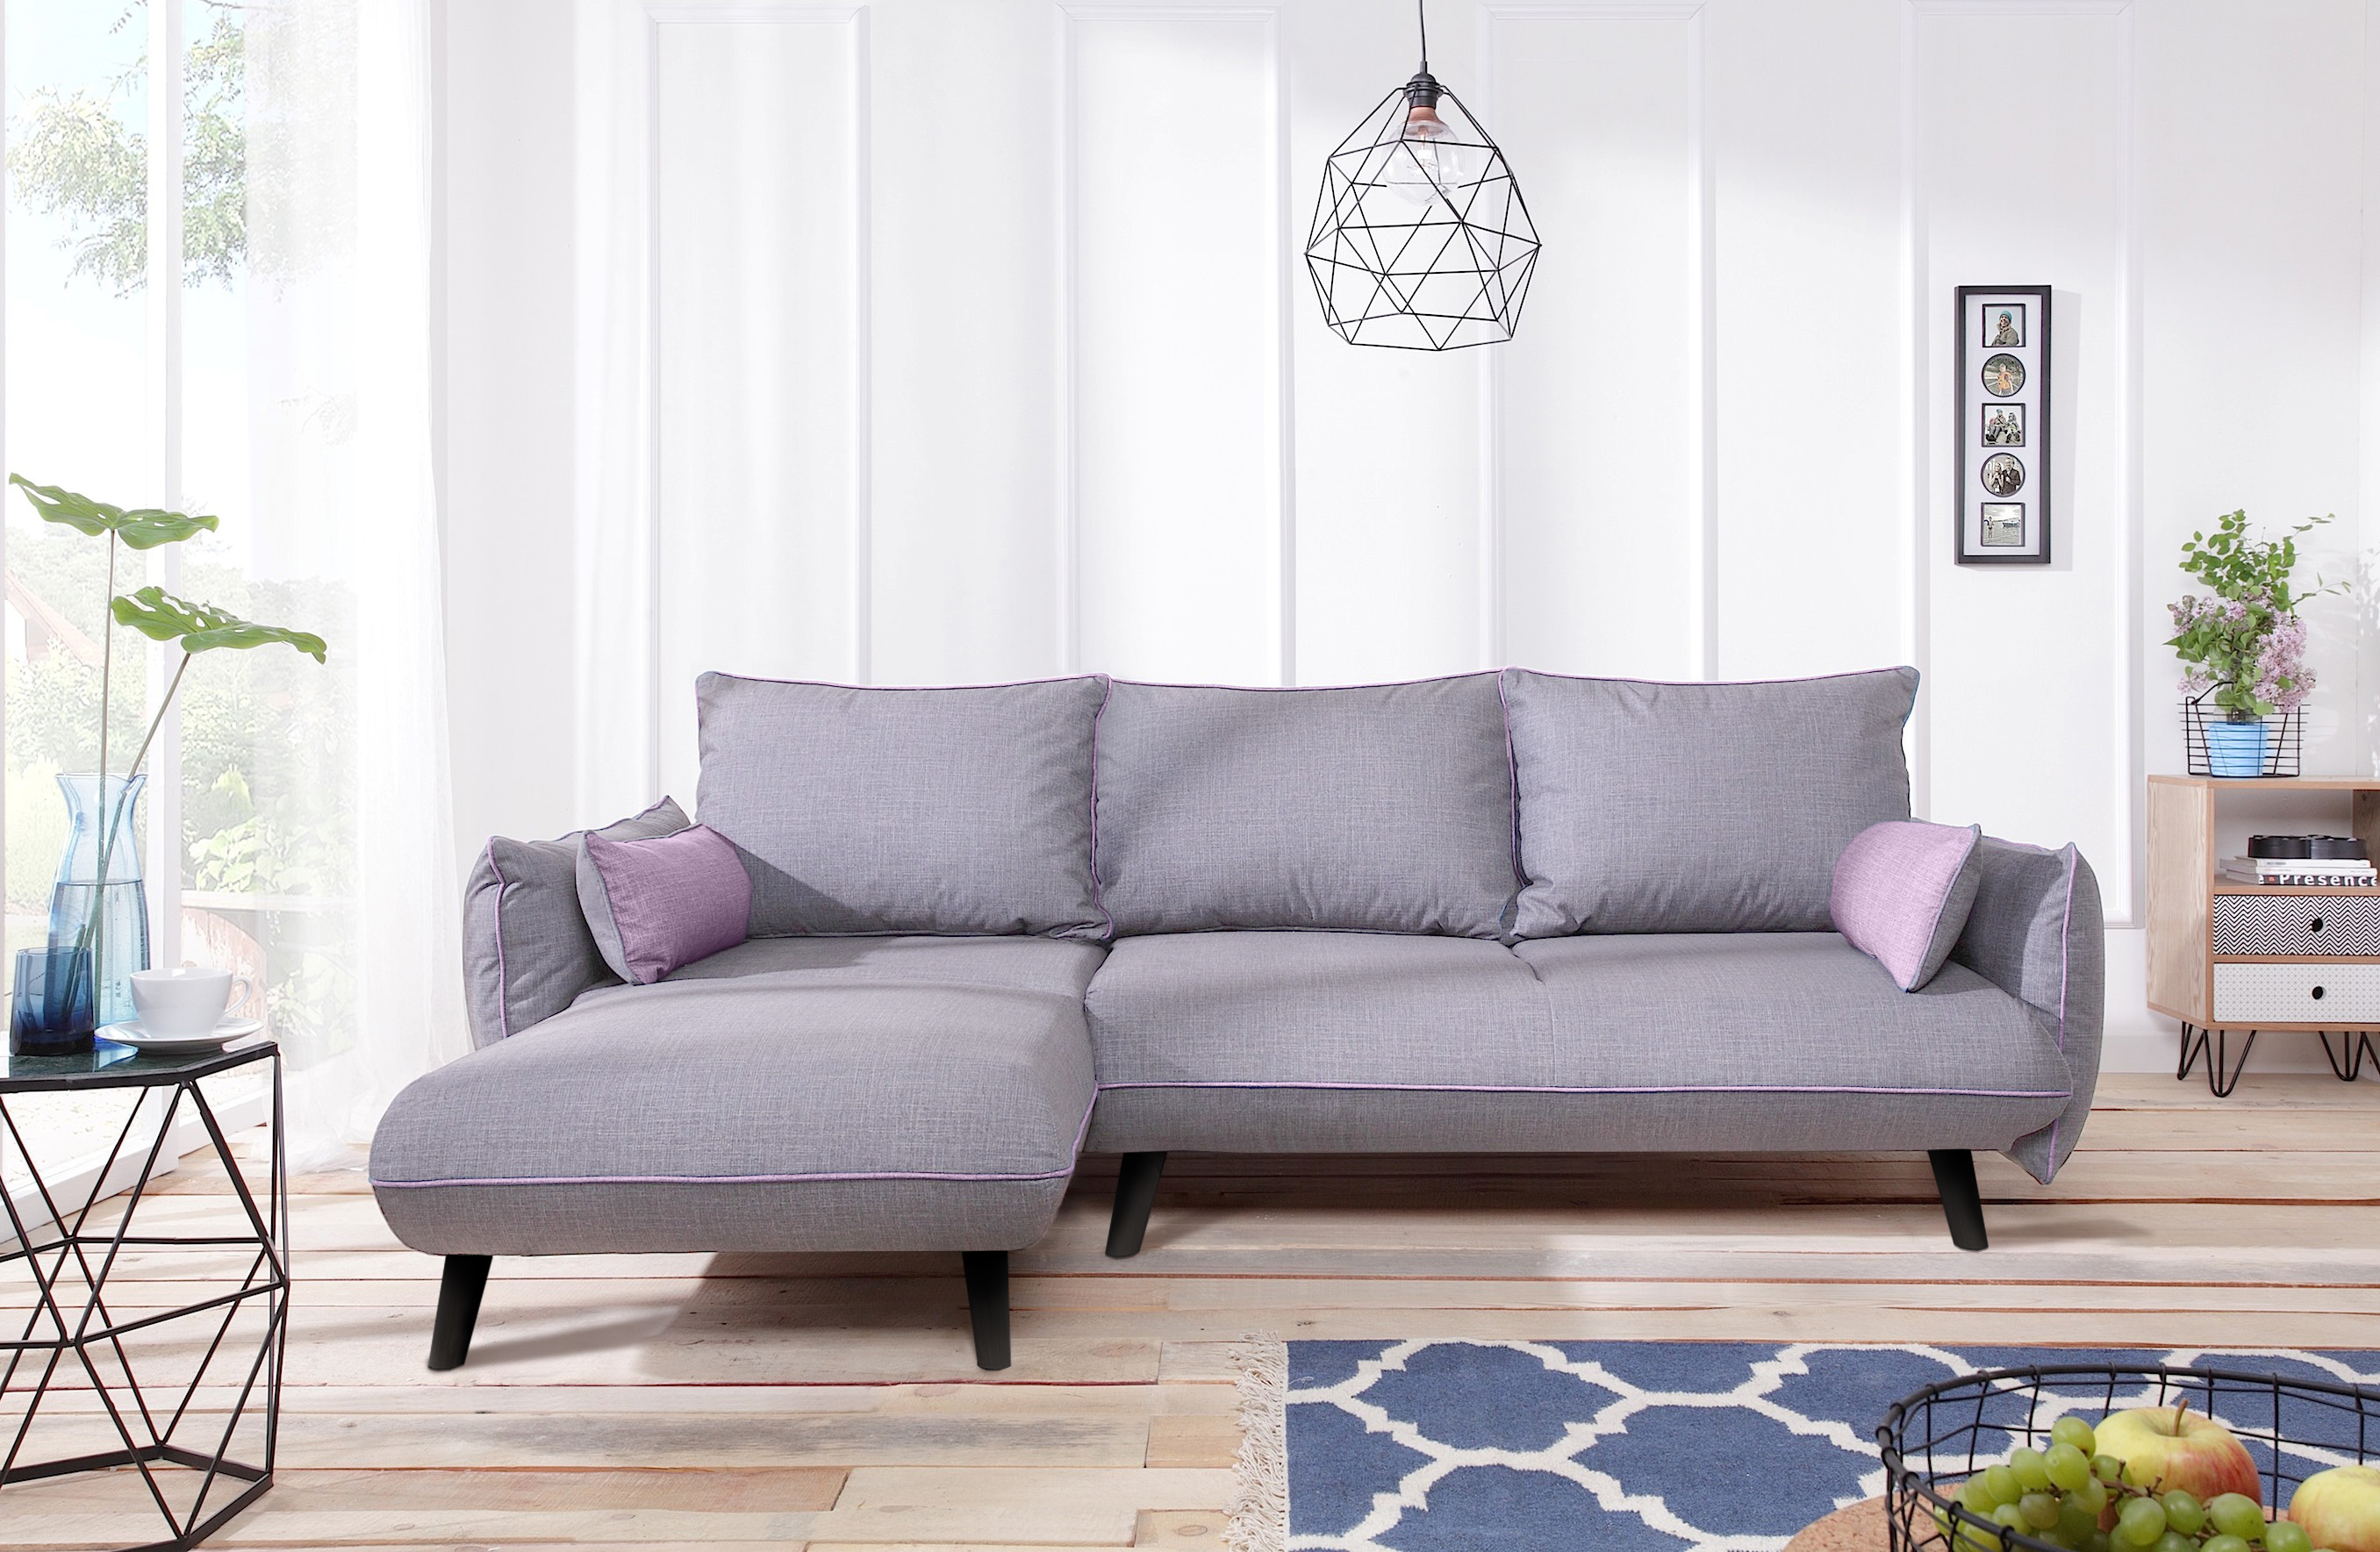 bobochic canap milano 4 places angle gauche convertible gris clair avec passpoil rose. Black Bedroom Furniture Sets. Home Design Ideas